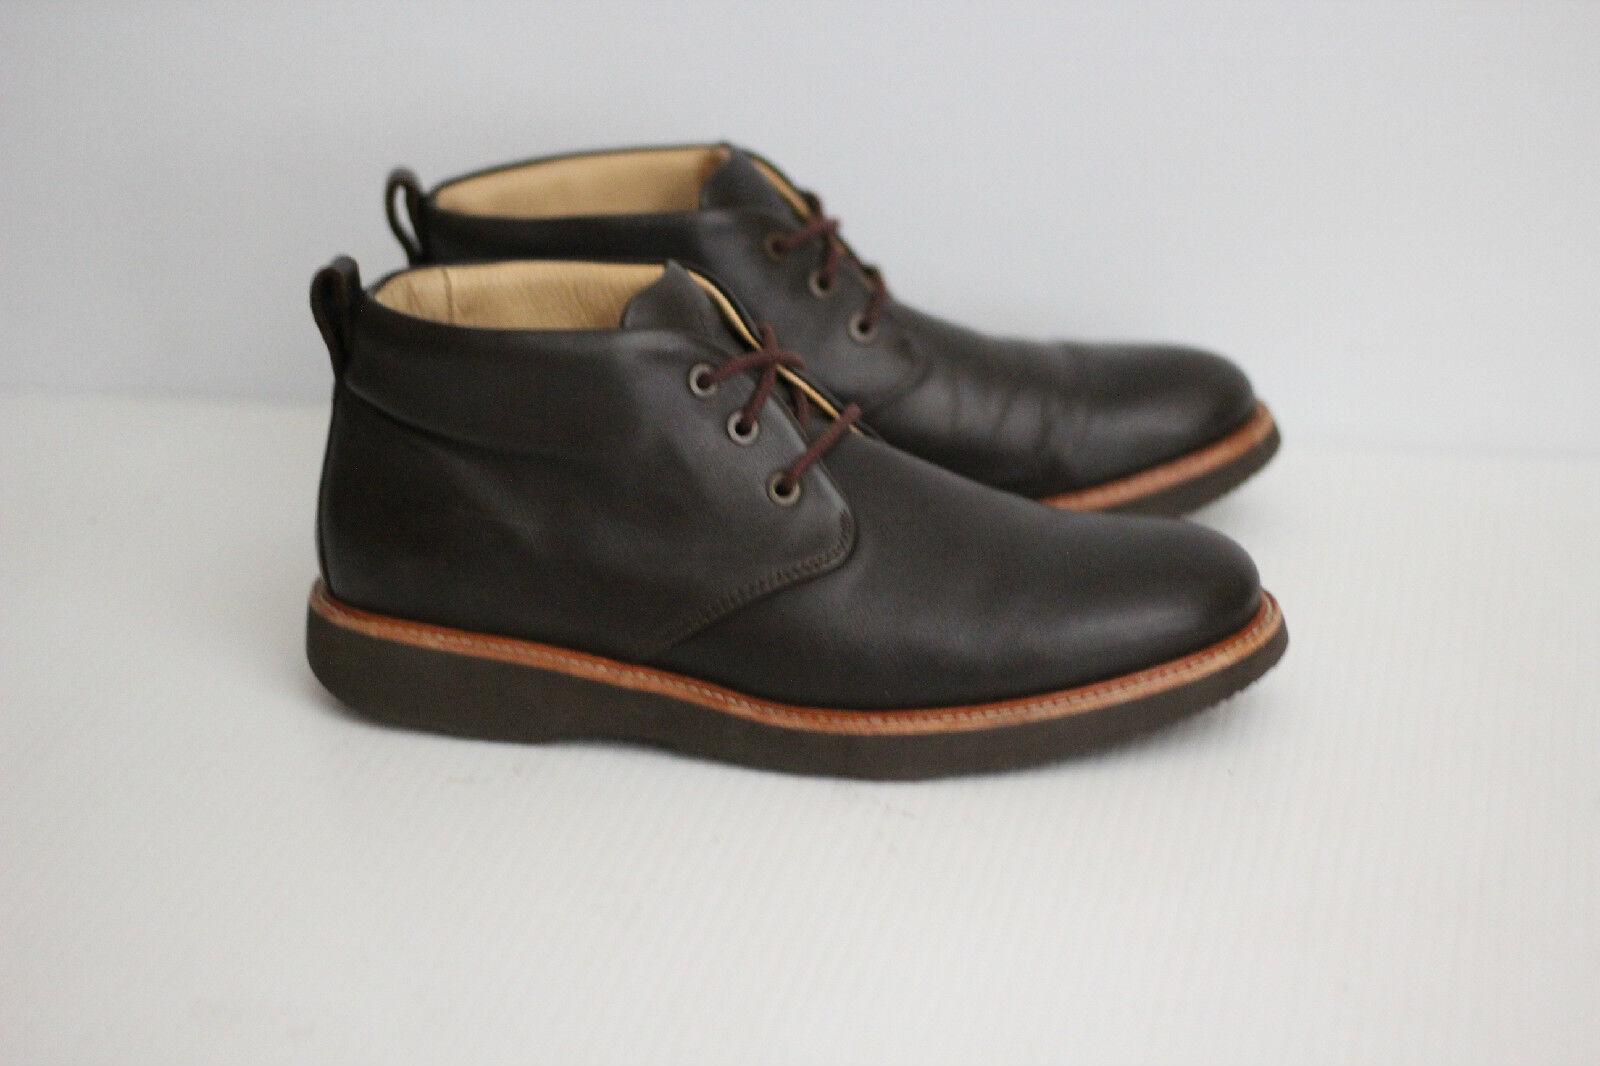 Samuel Hubbard Re-Boot Chukka Boot - Brown - Size 8.5   (S44)